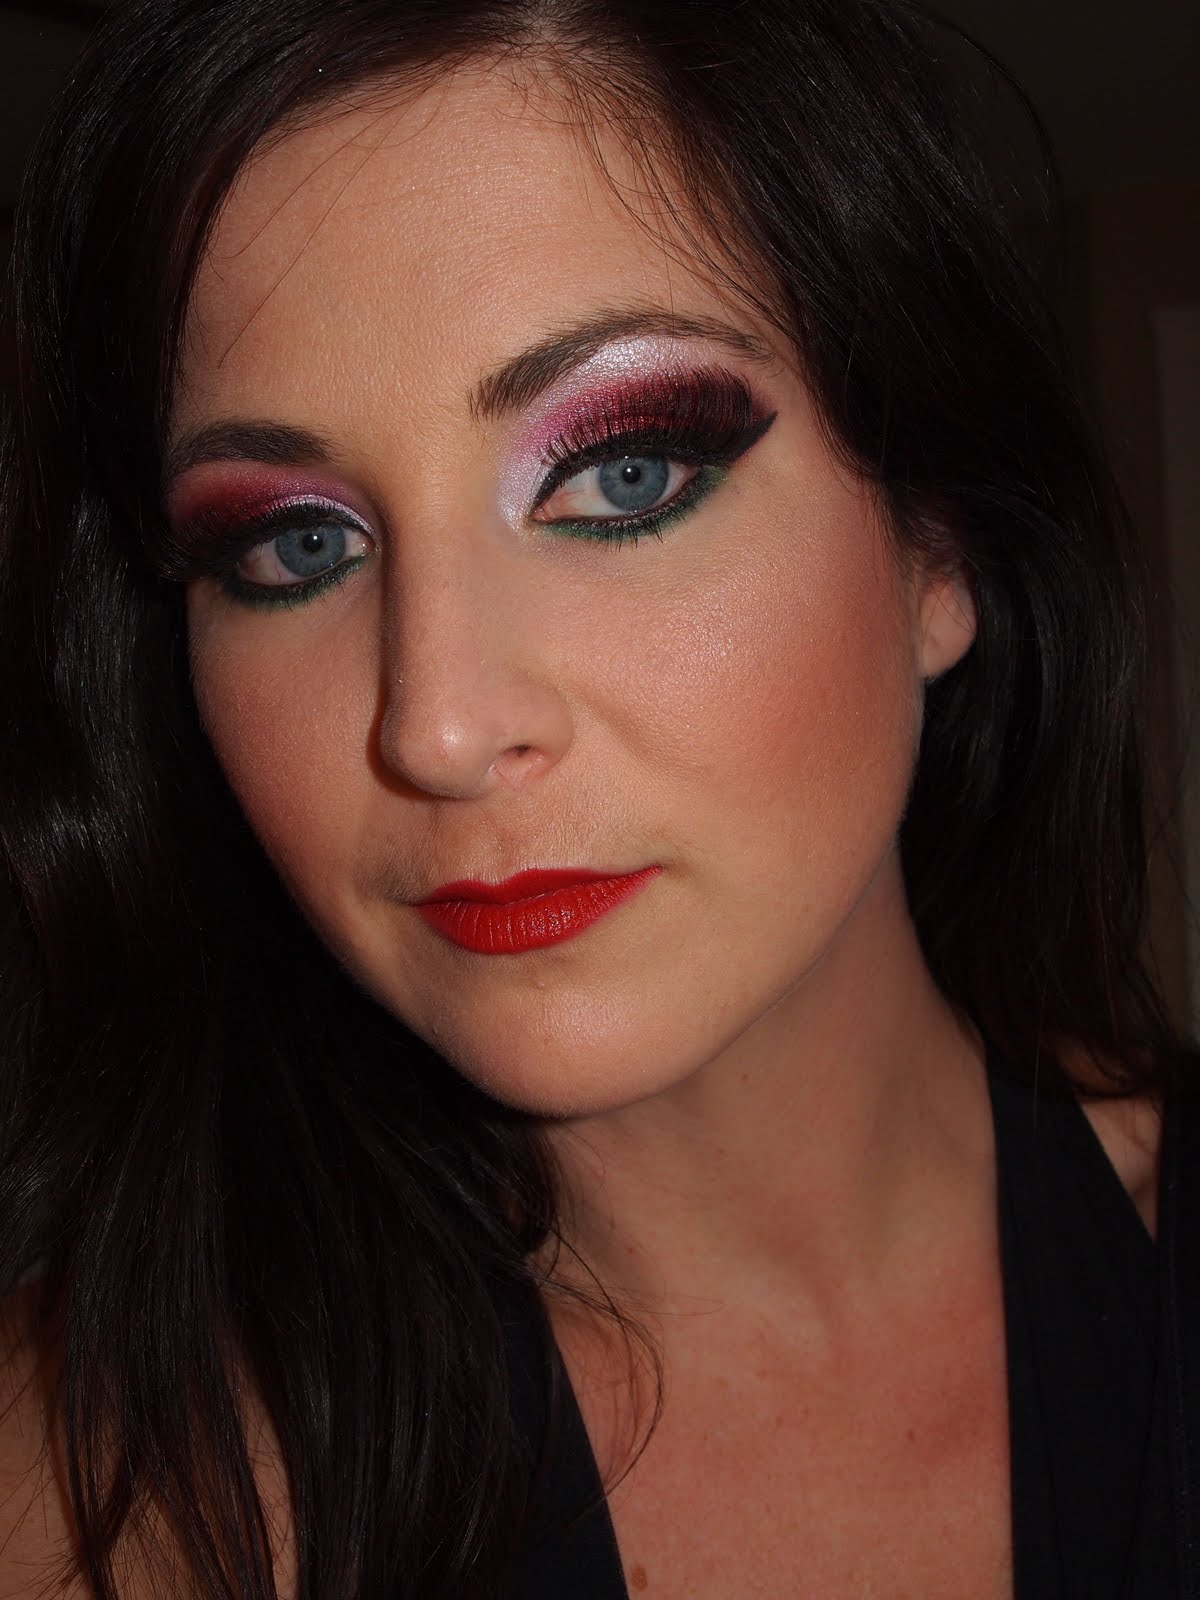 PEI Makeup Artist: Happy Cinco de Mayo!